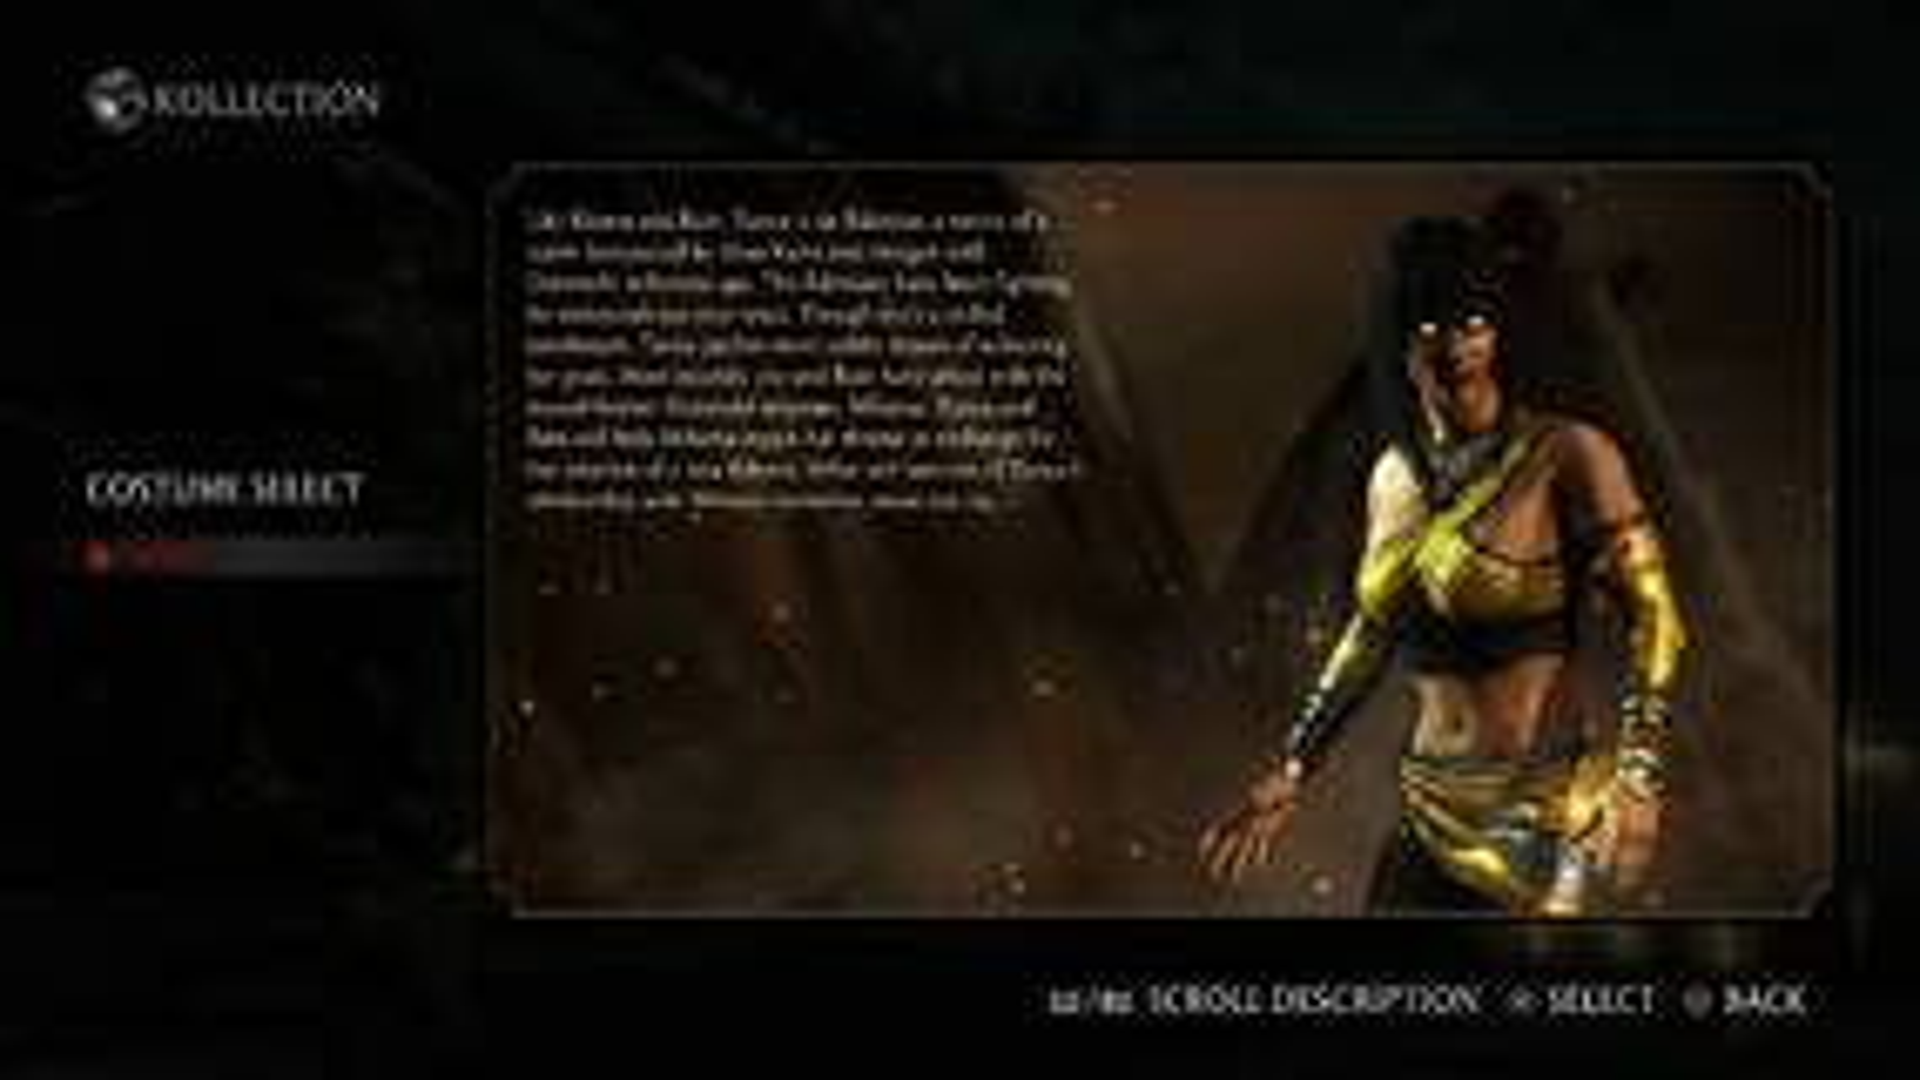 Image for Take a peek at upcoming costumes in Mortal Kombat X